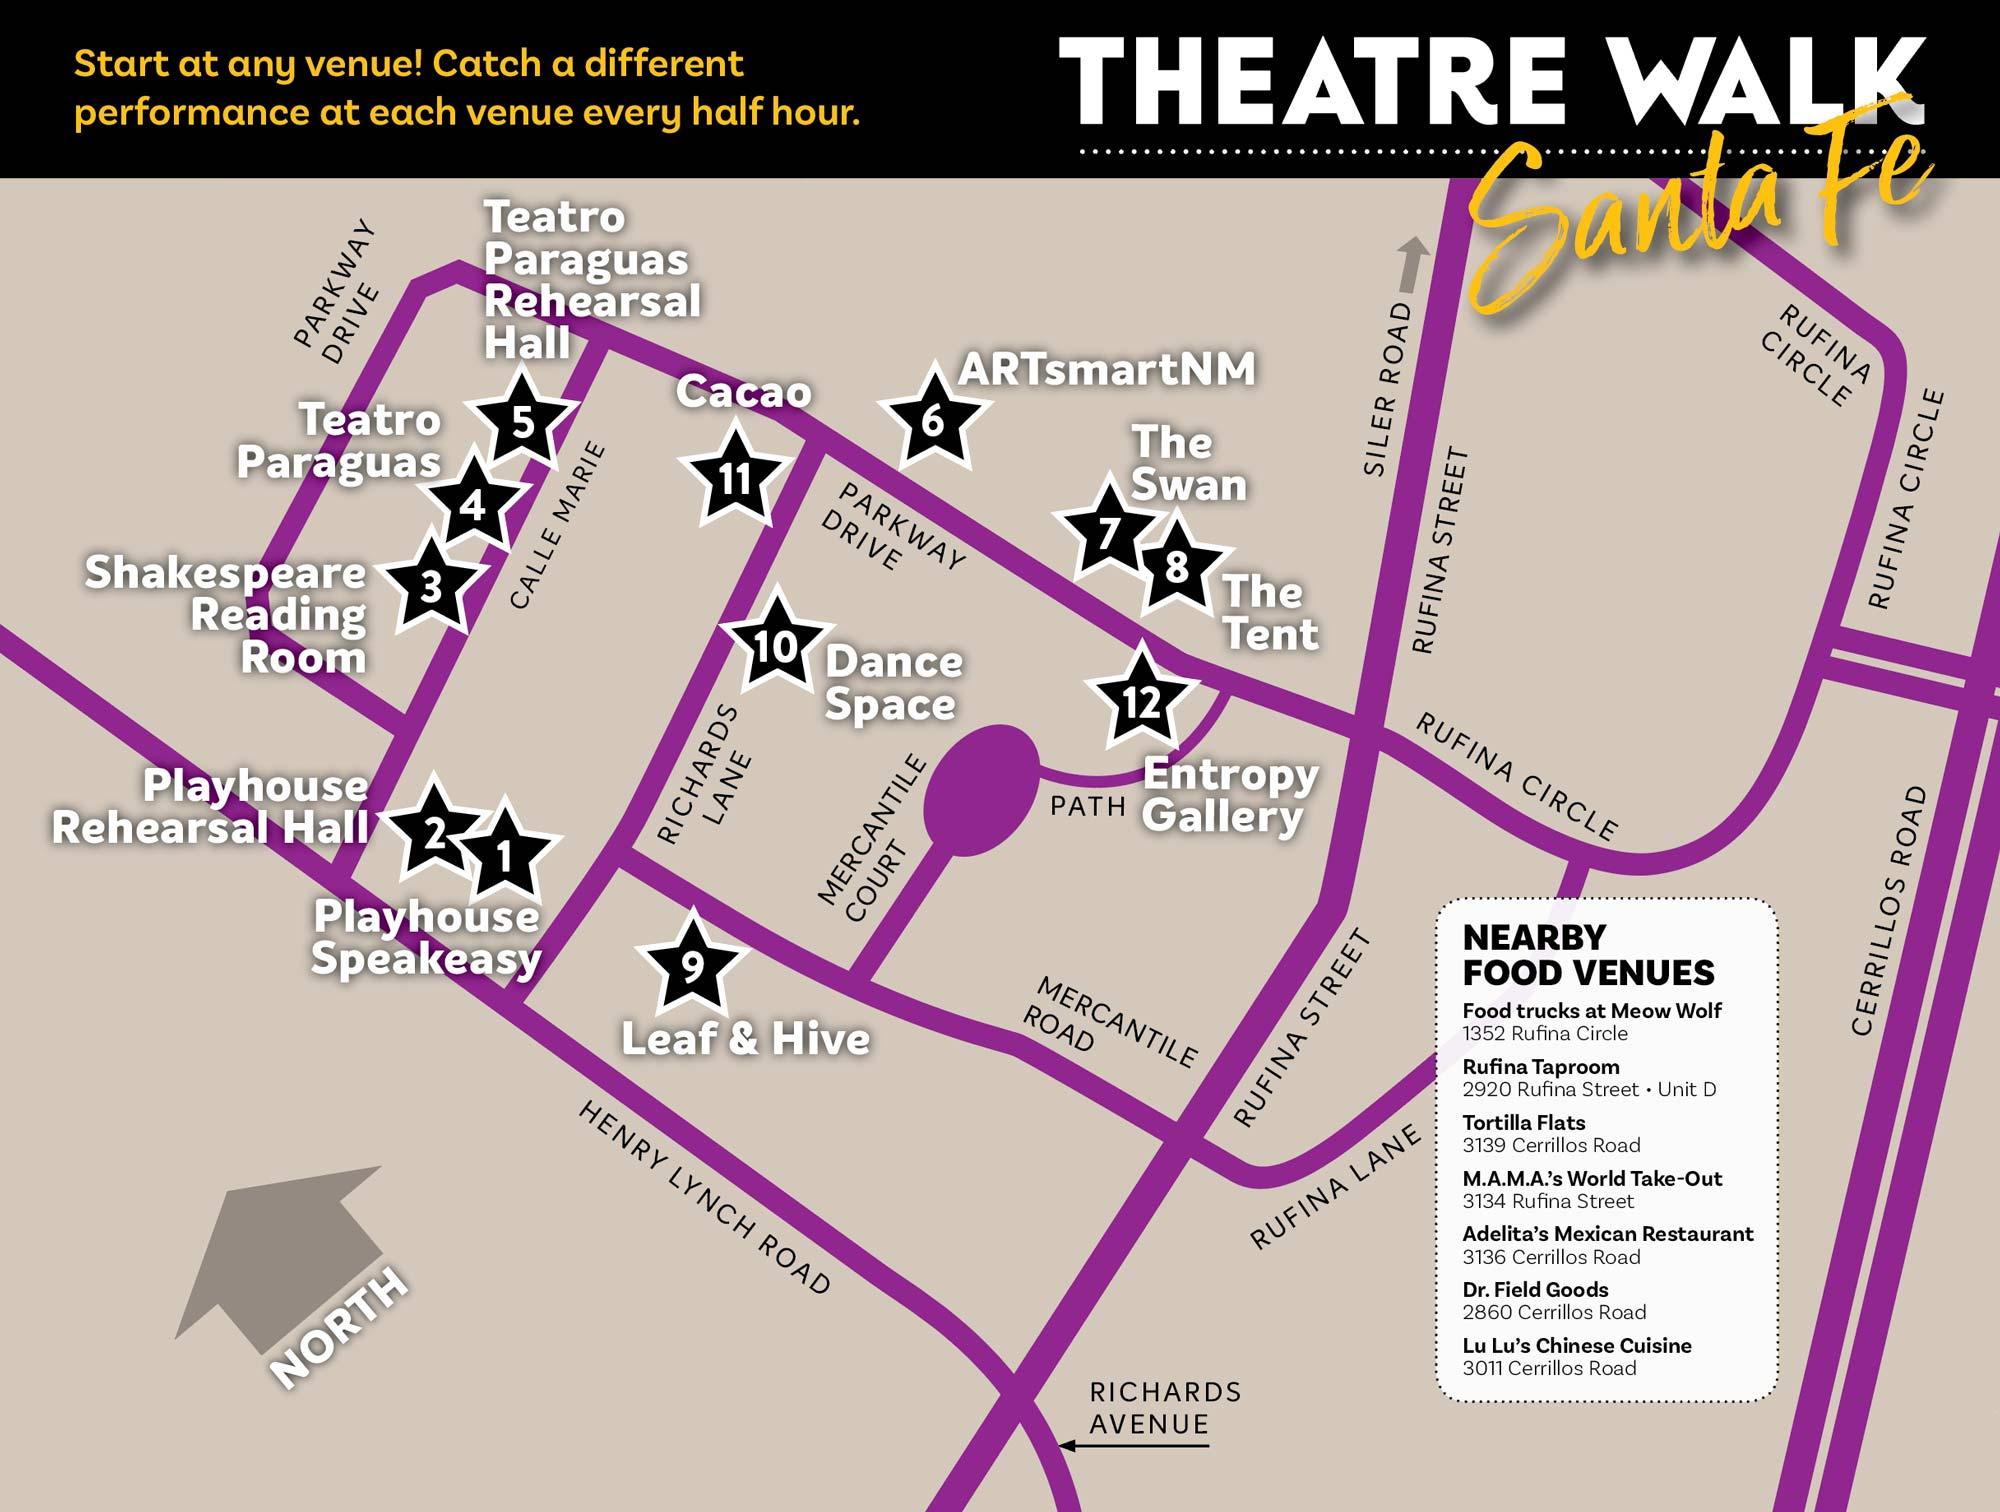 Theatre-Walk-map-2019-revise.jpg